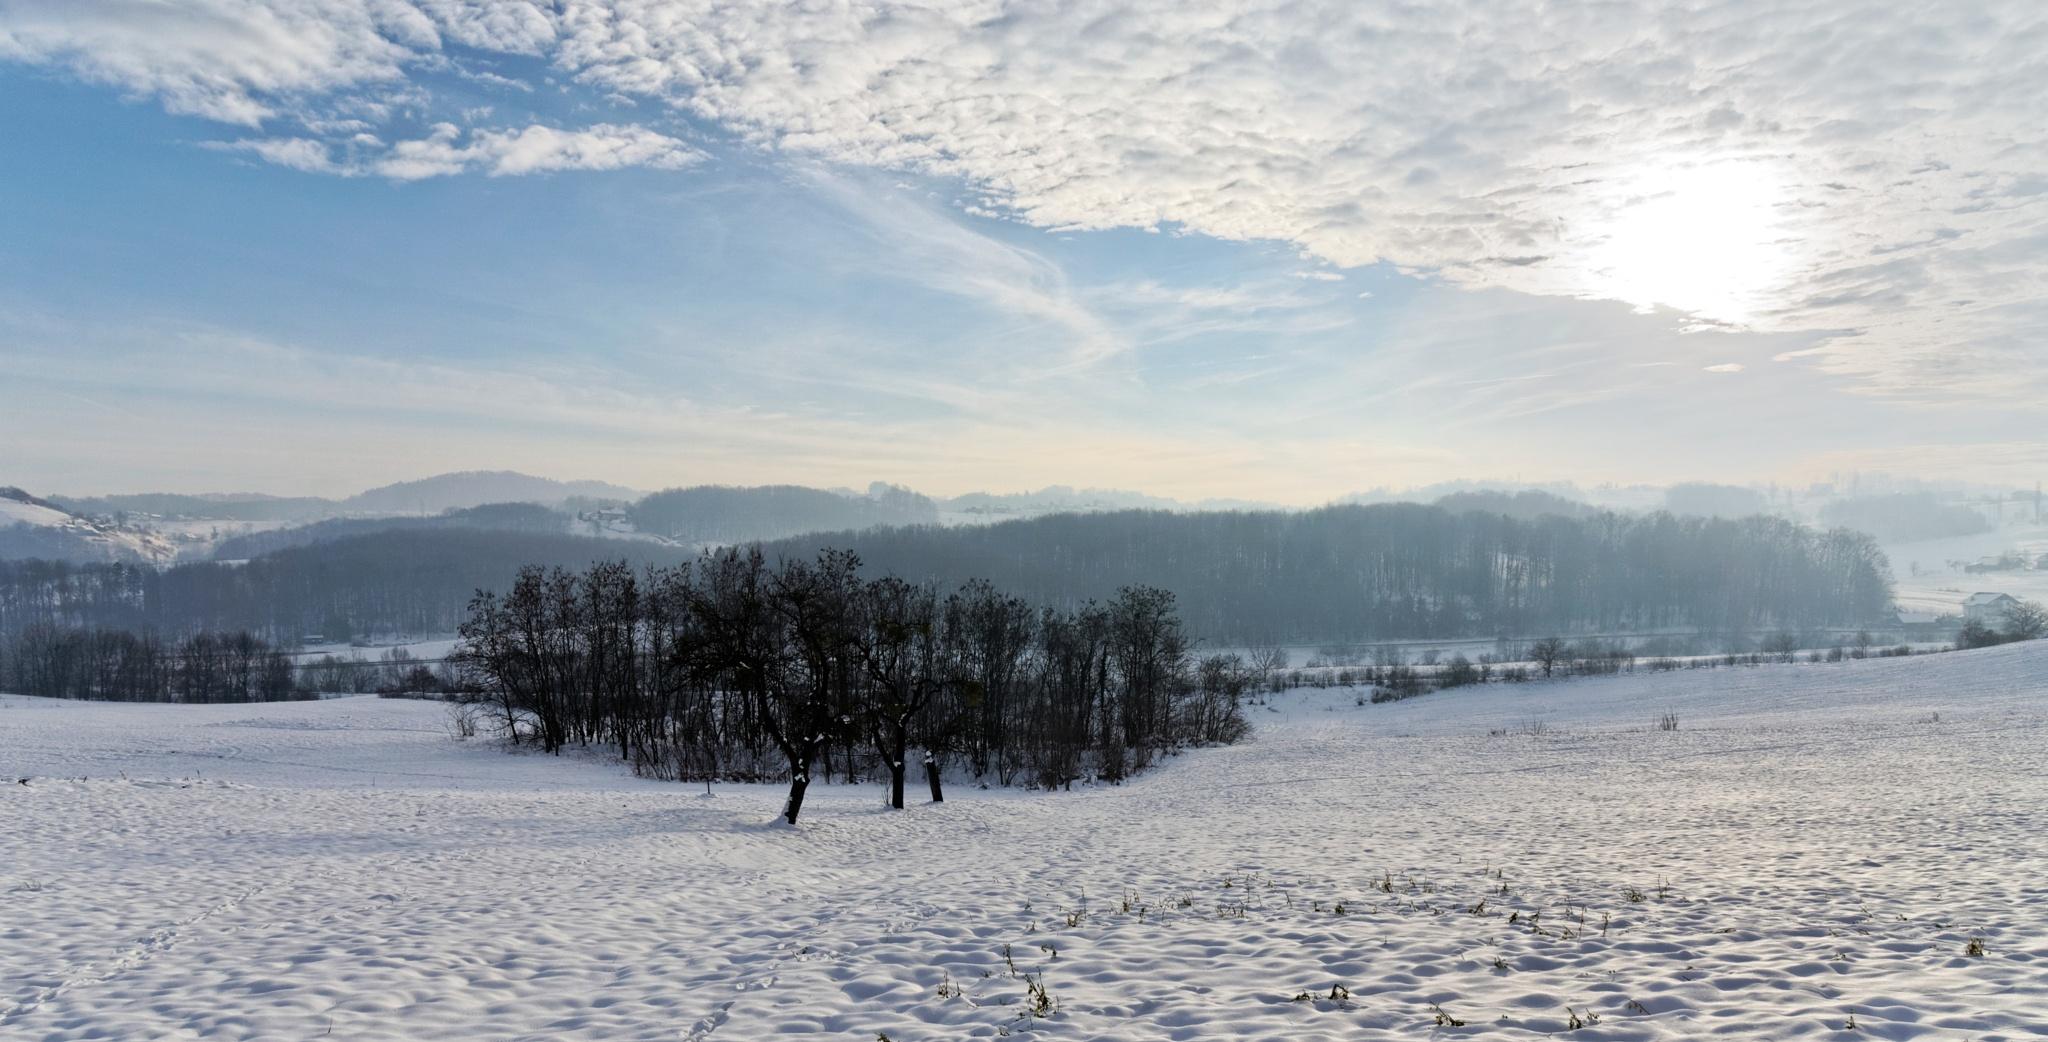 Winter panorama by Marko Erman